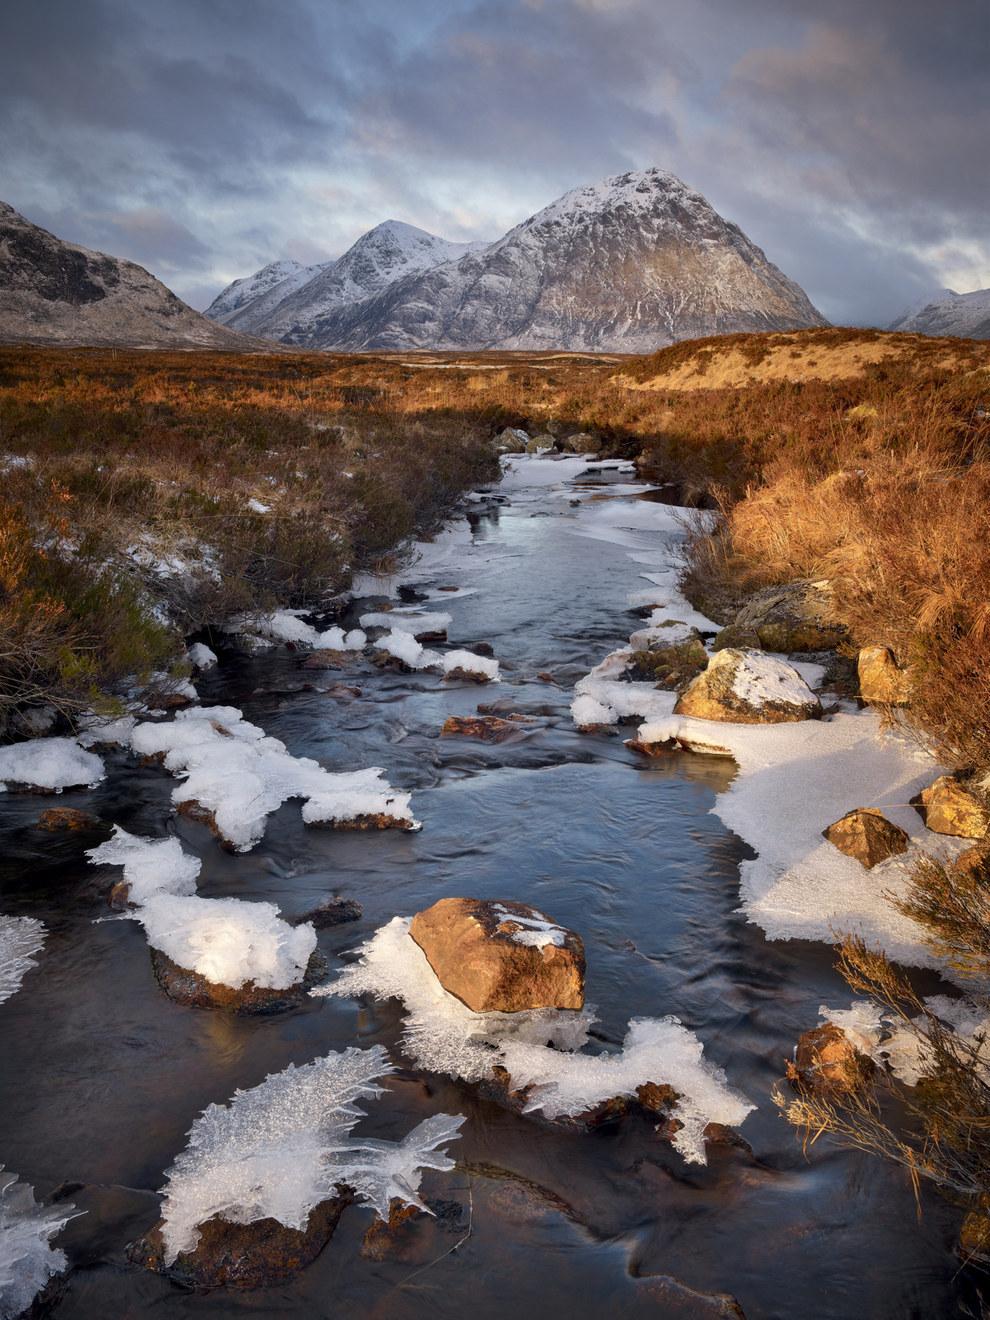 6. Buachaille Etive Mòr, Scottish Highlands.